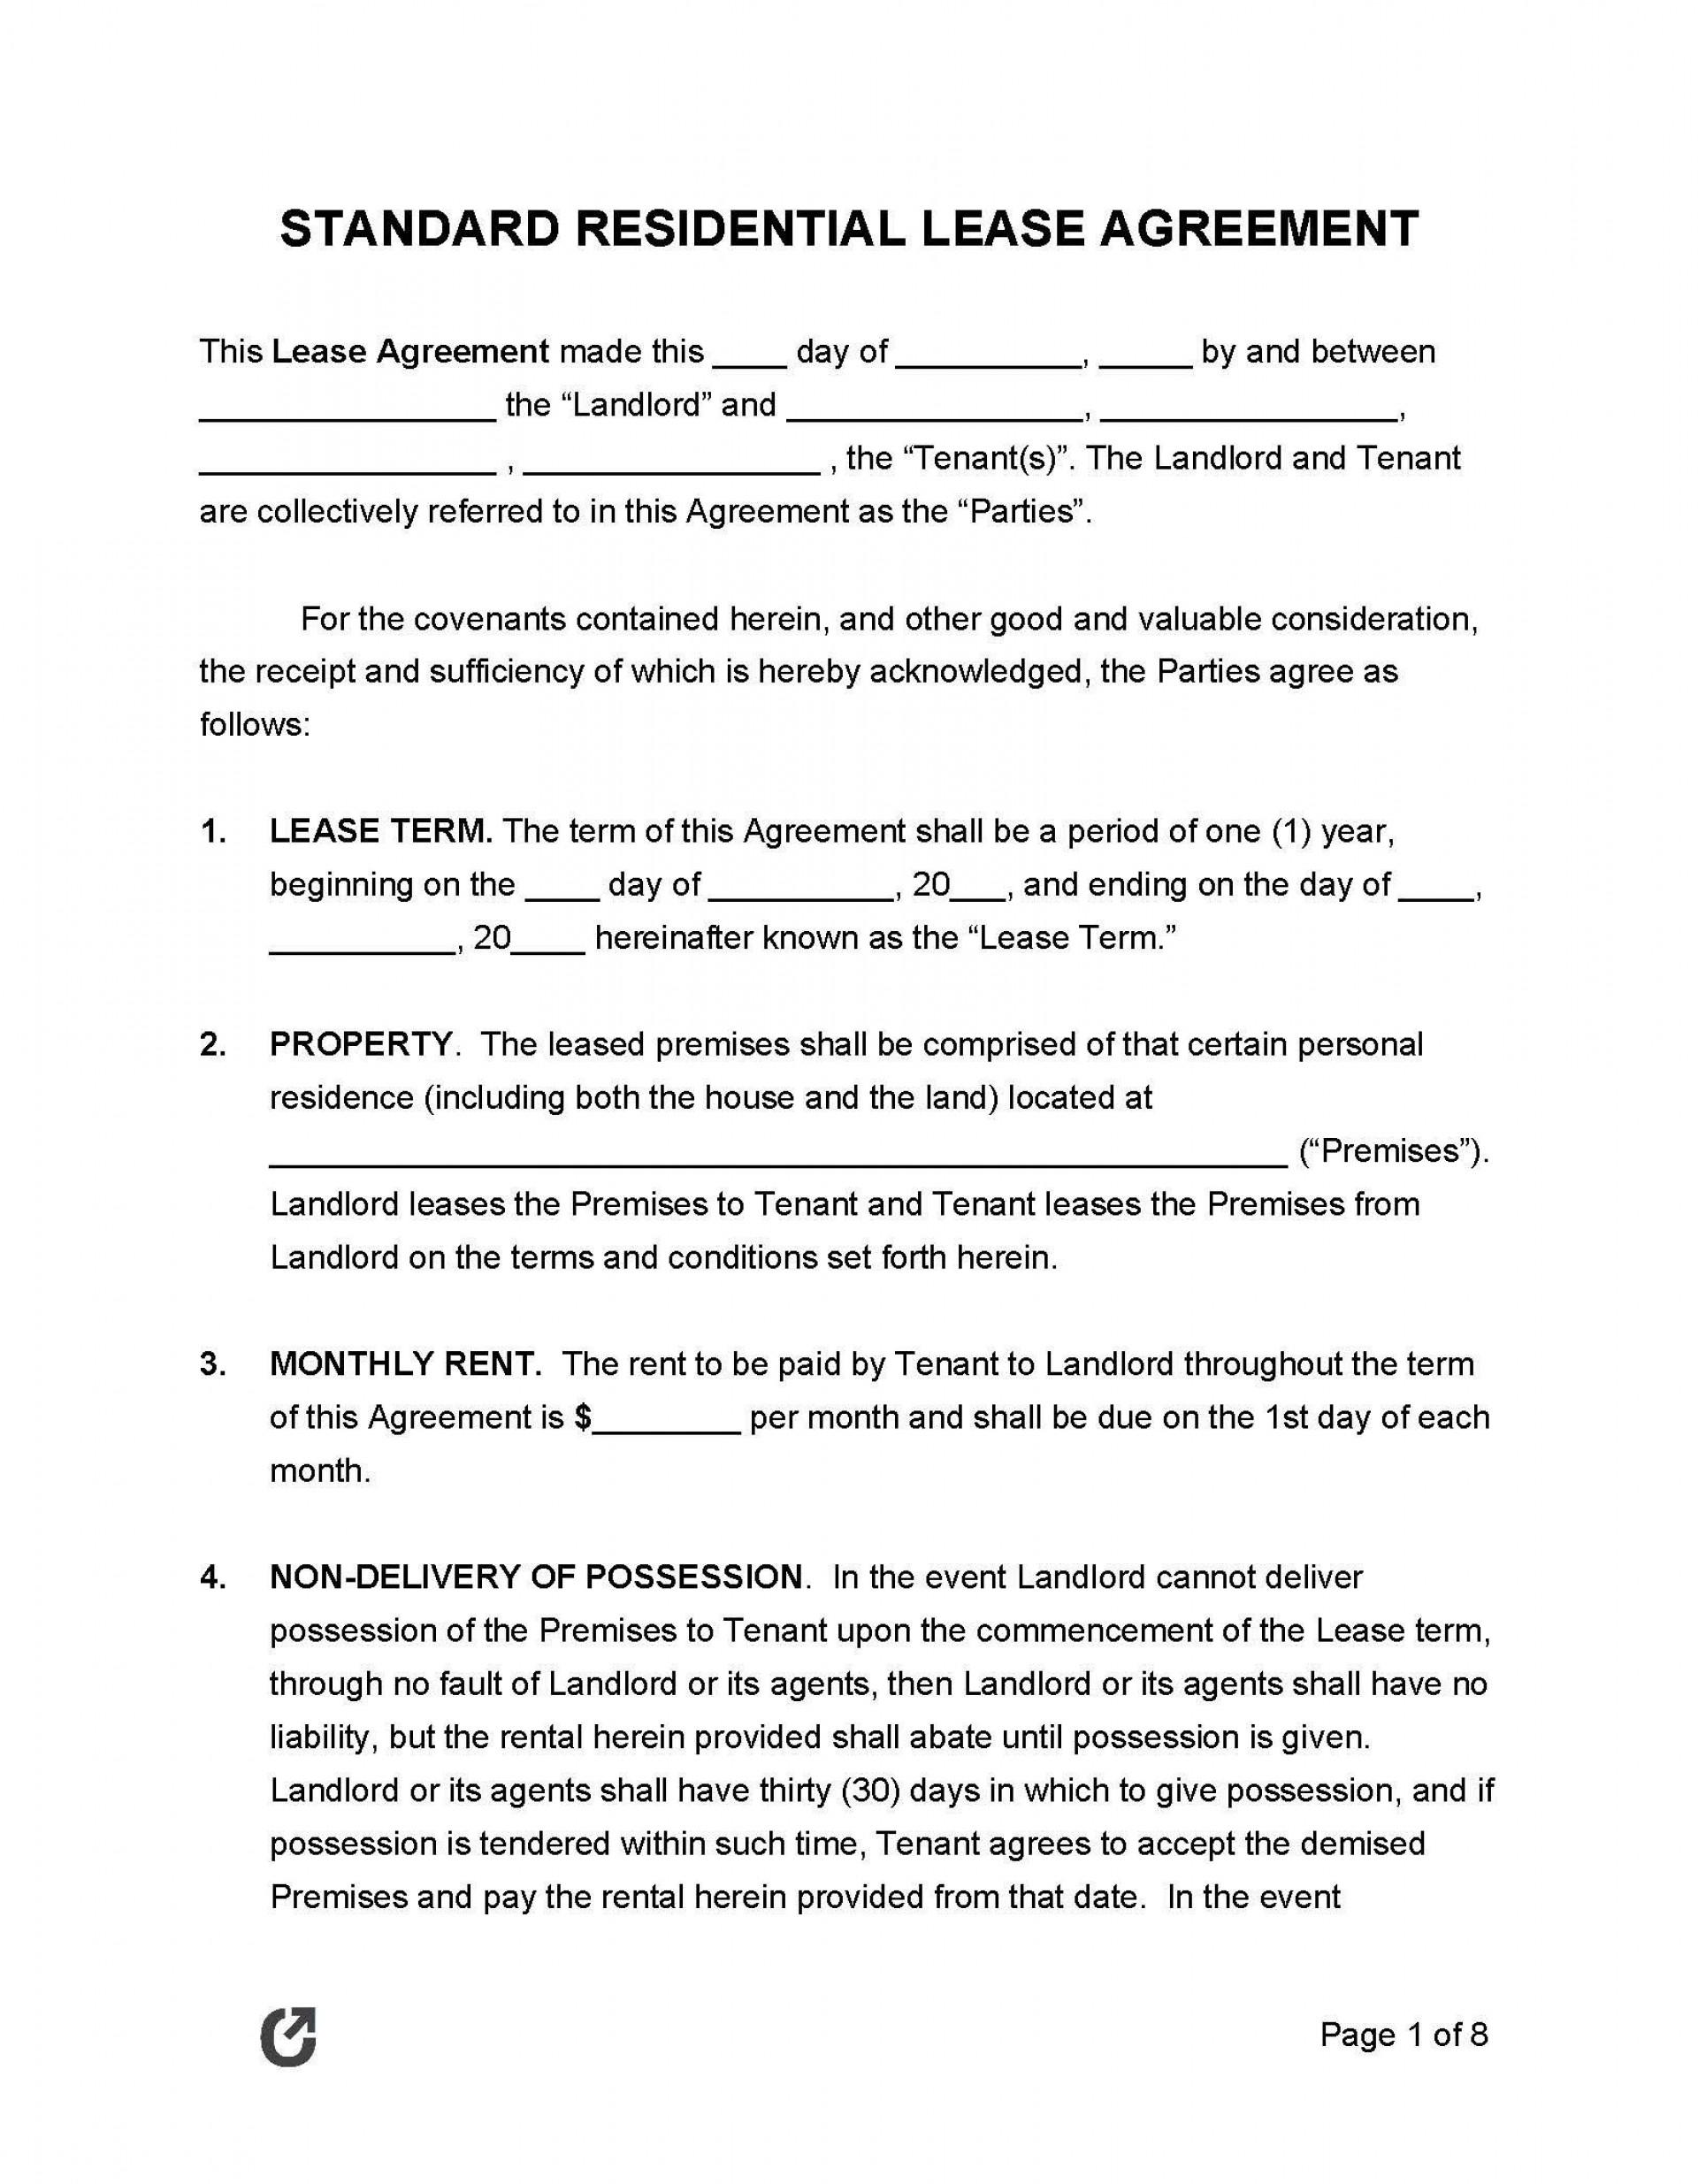 009 Singular House Rental Agreement Template Highest Quality  Home Free Ireland Form1920